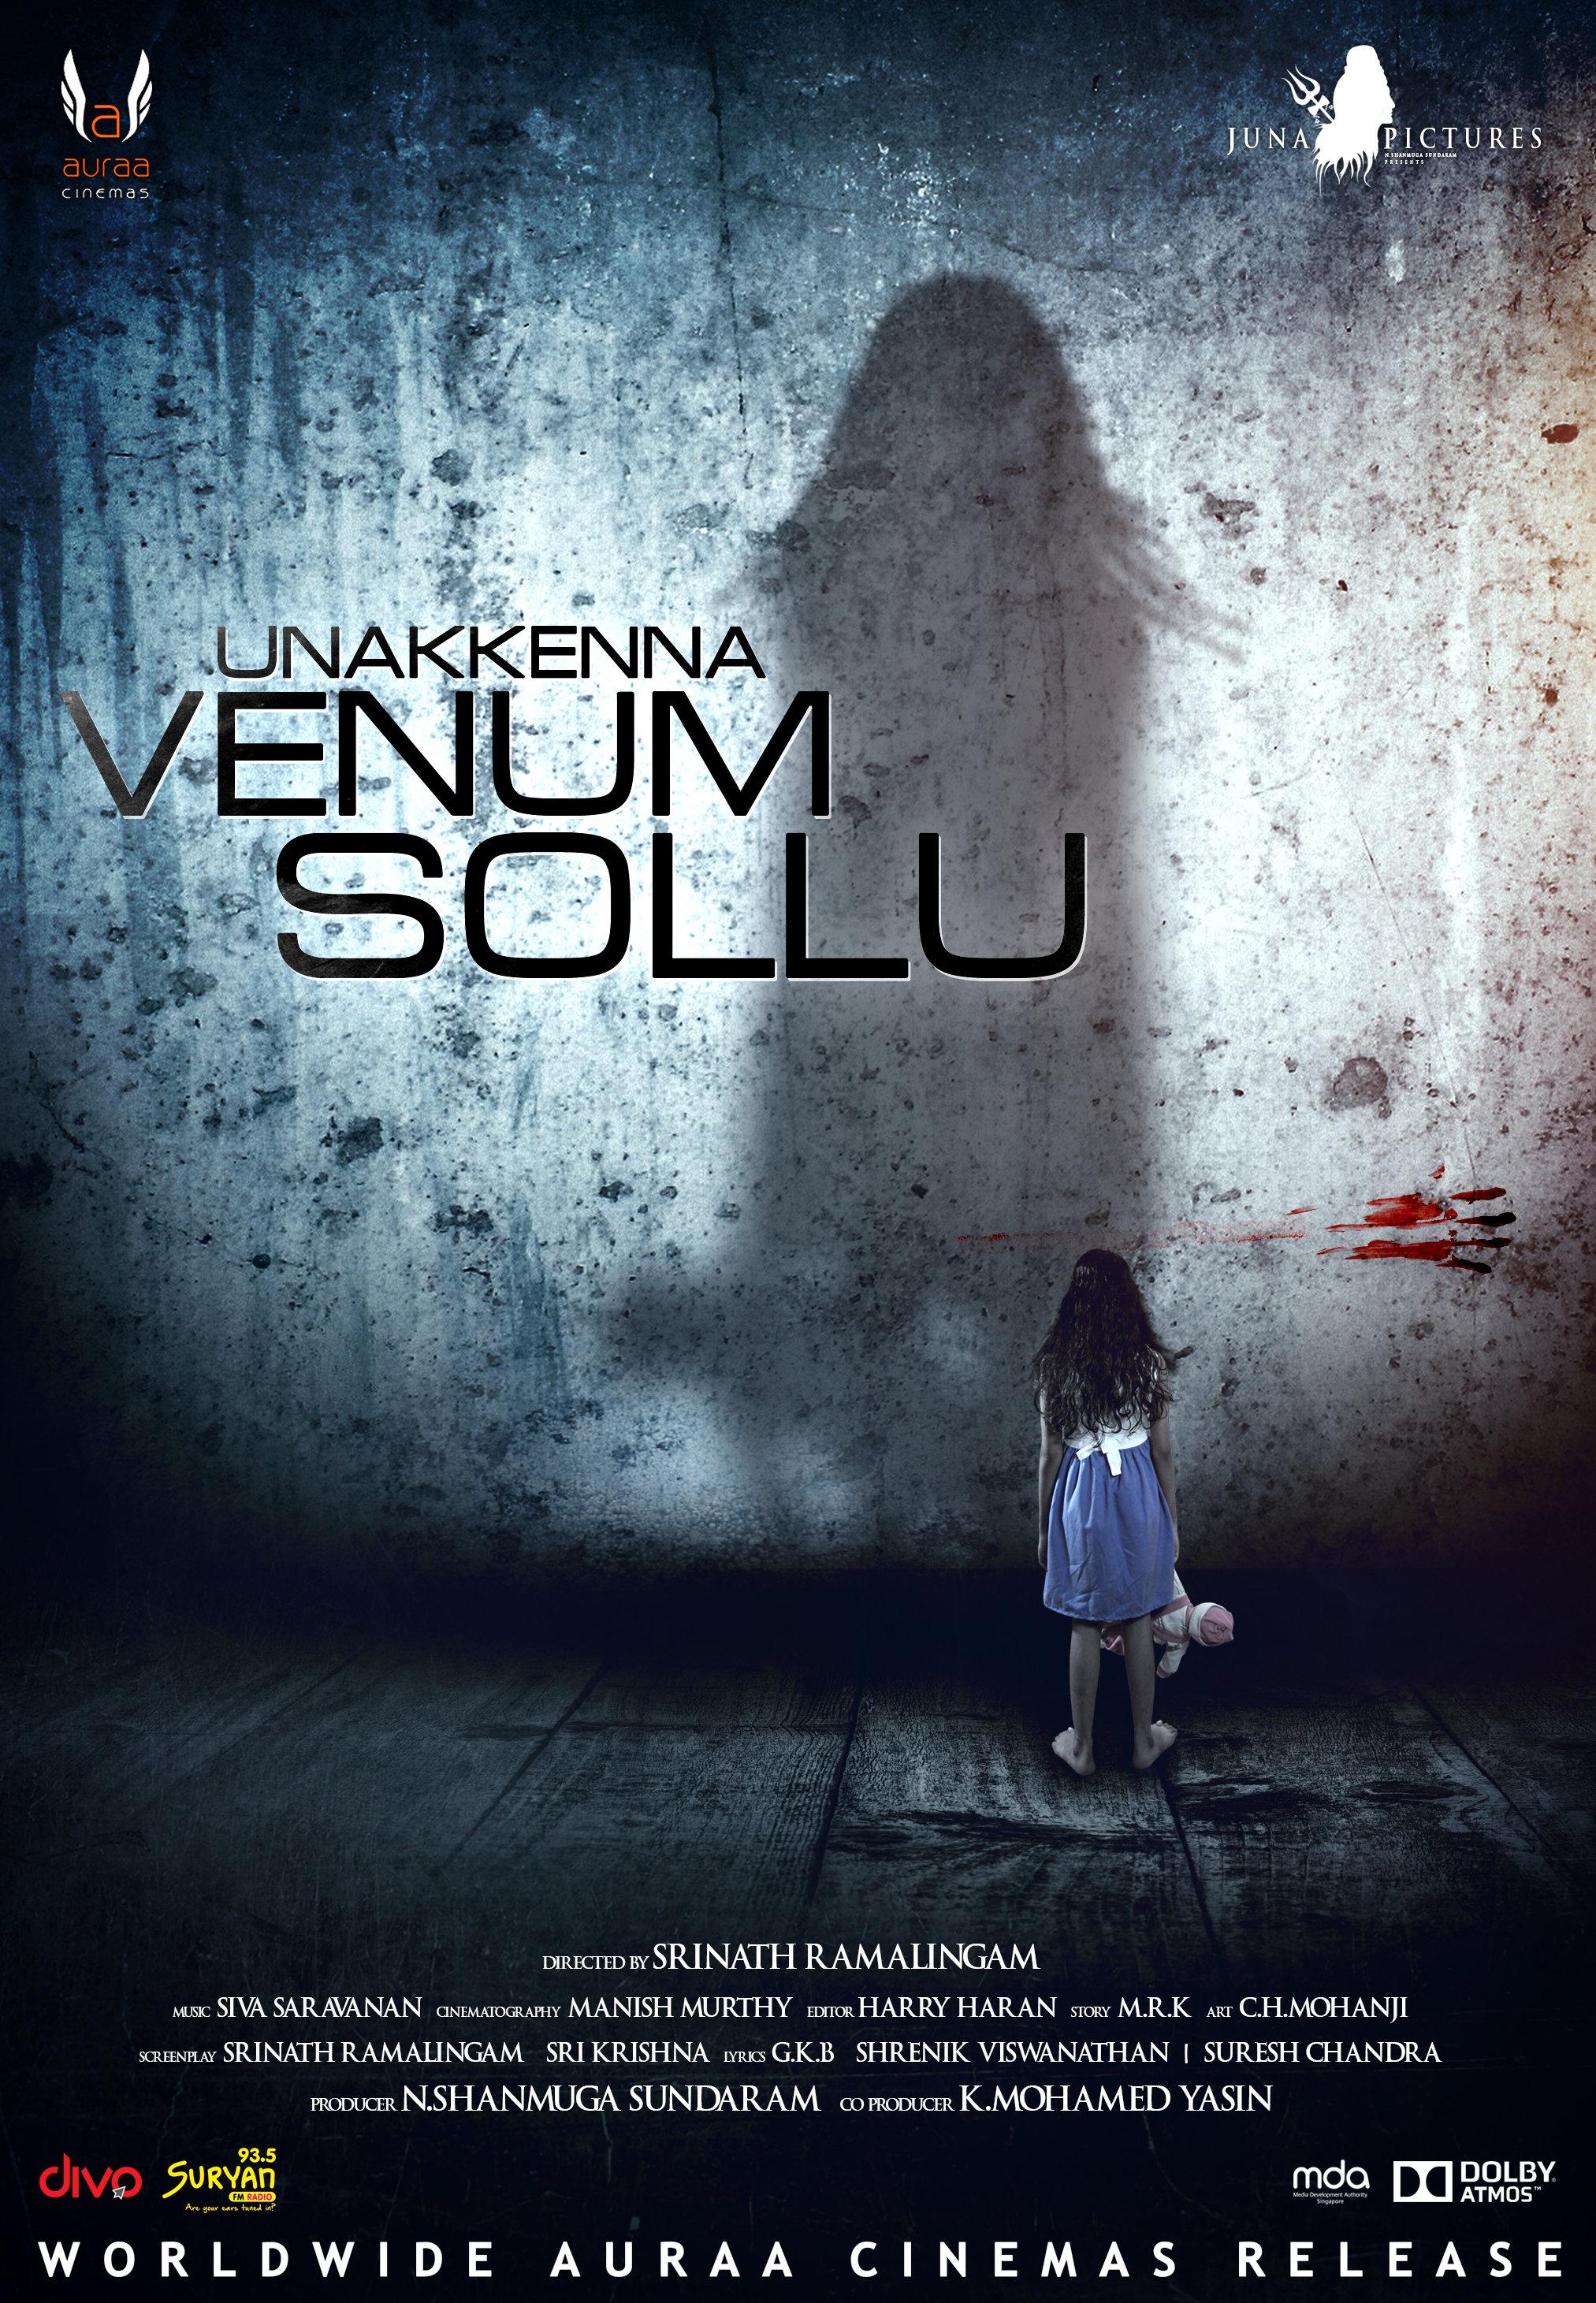 Unakkenna Venum Sollu: What Do You Want... kapak